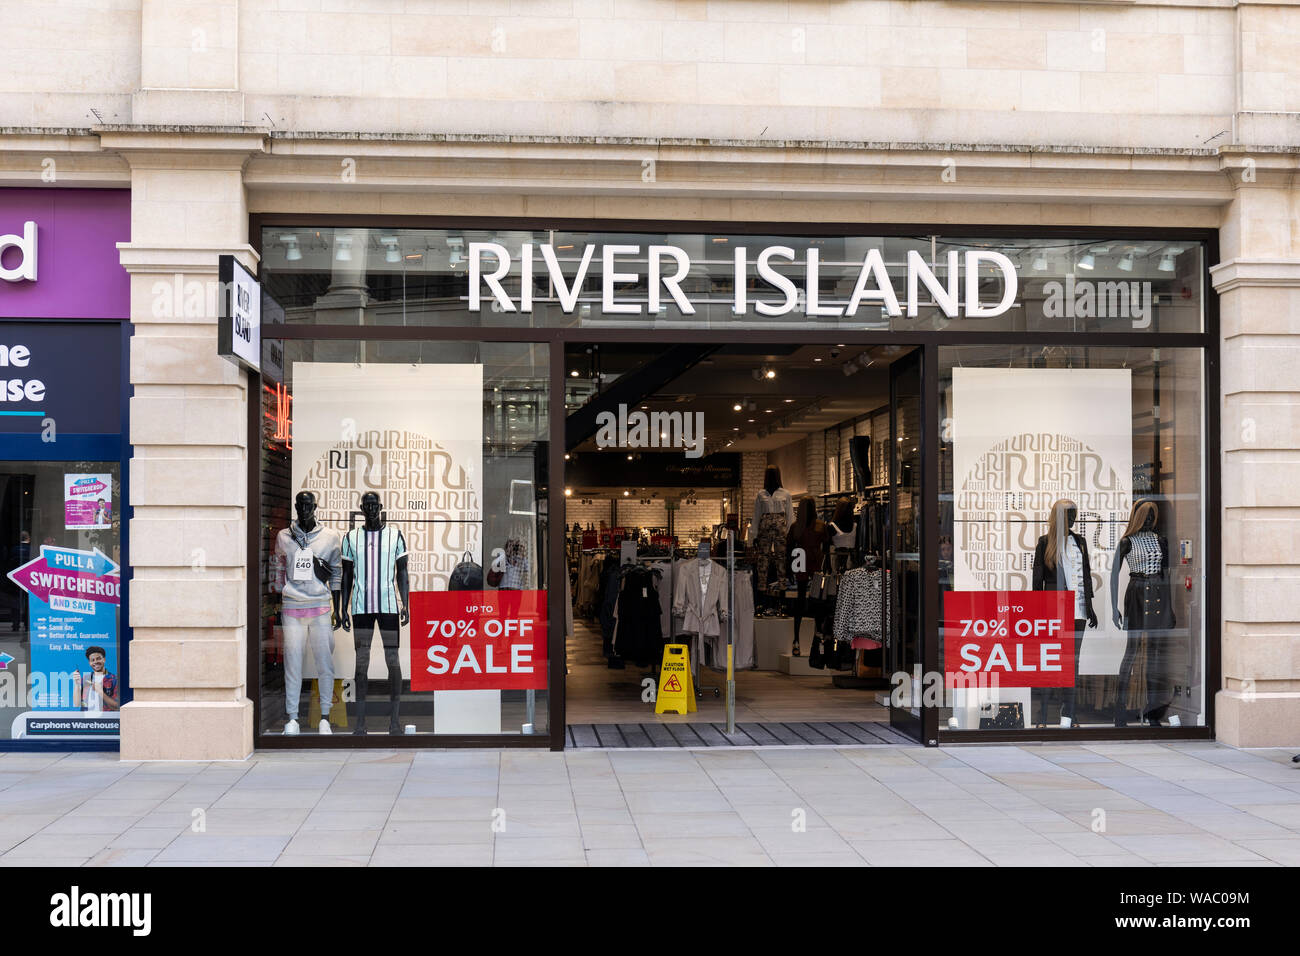 River Island Store, SouthGate shopping centre, Bath UK Stock Photo